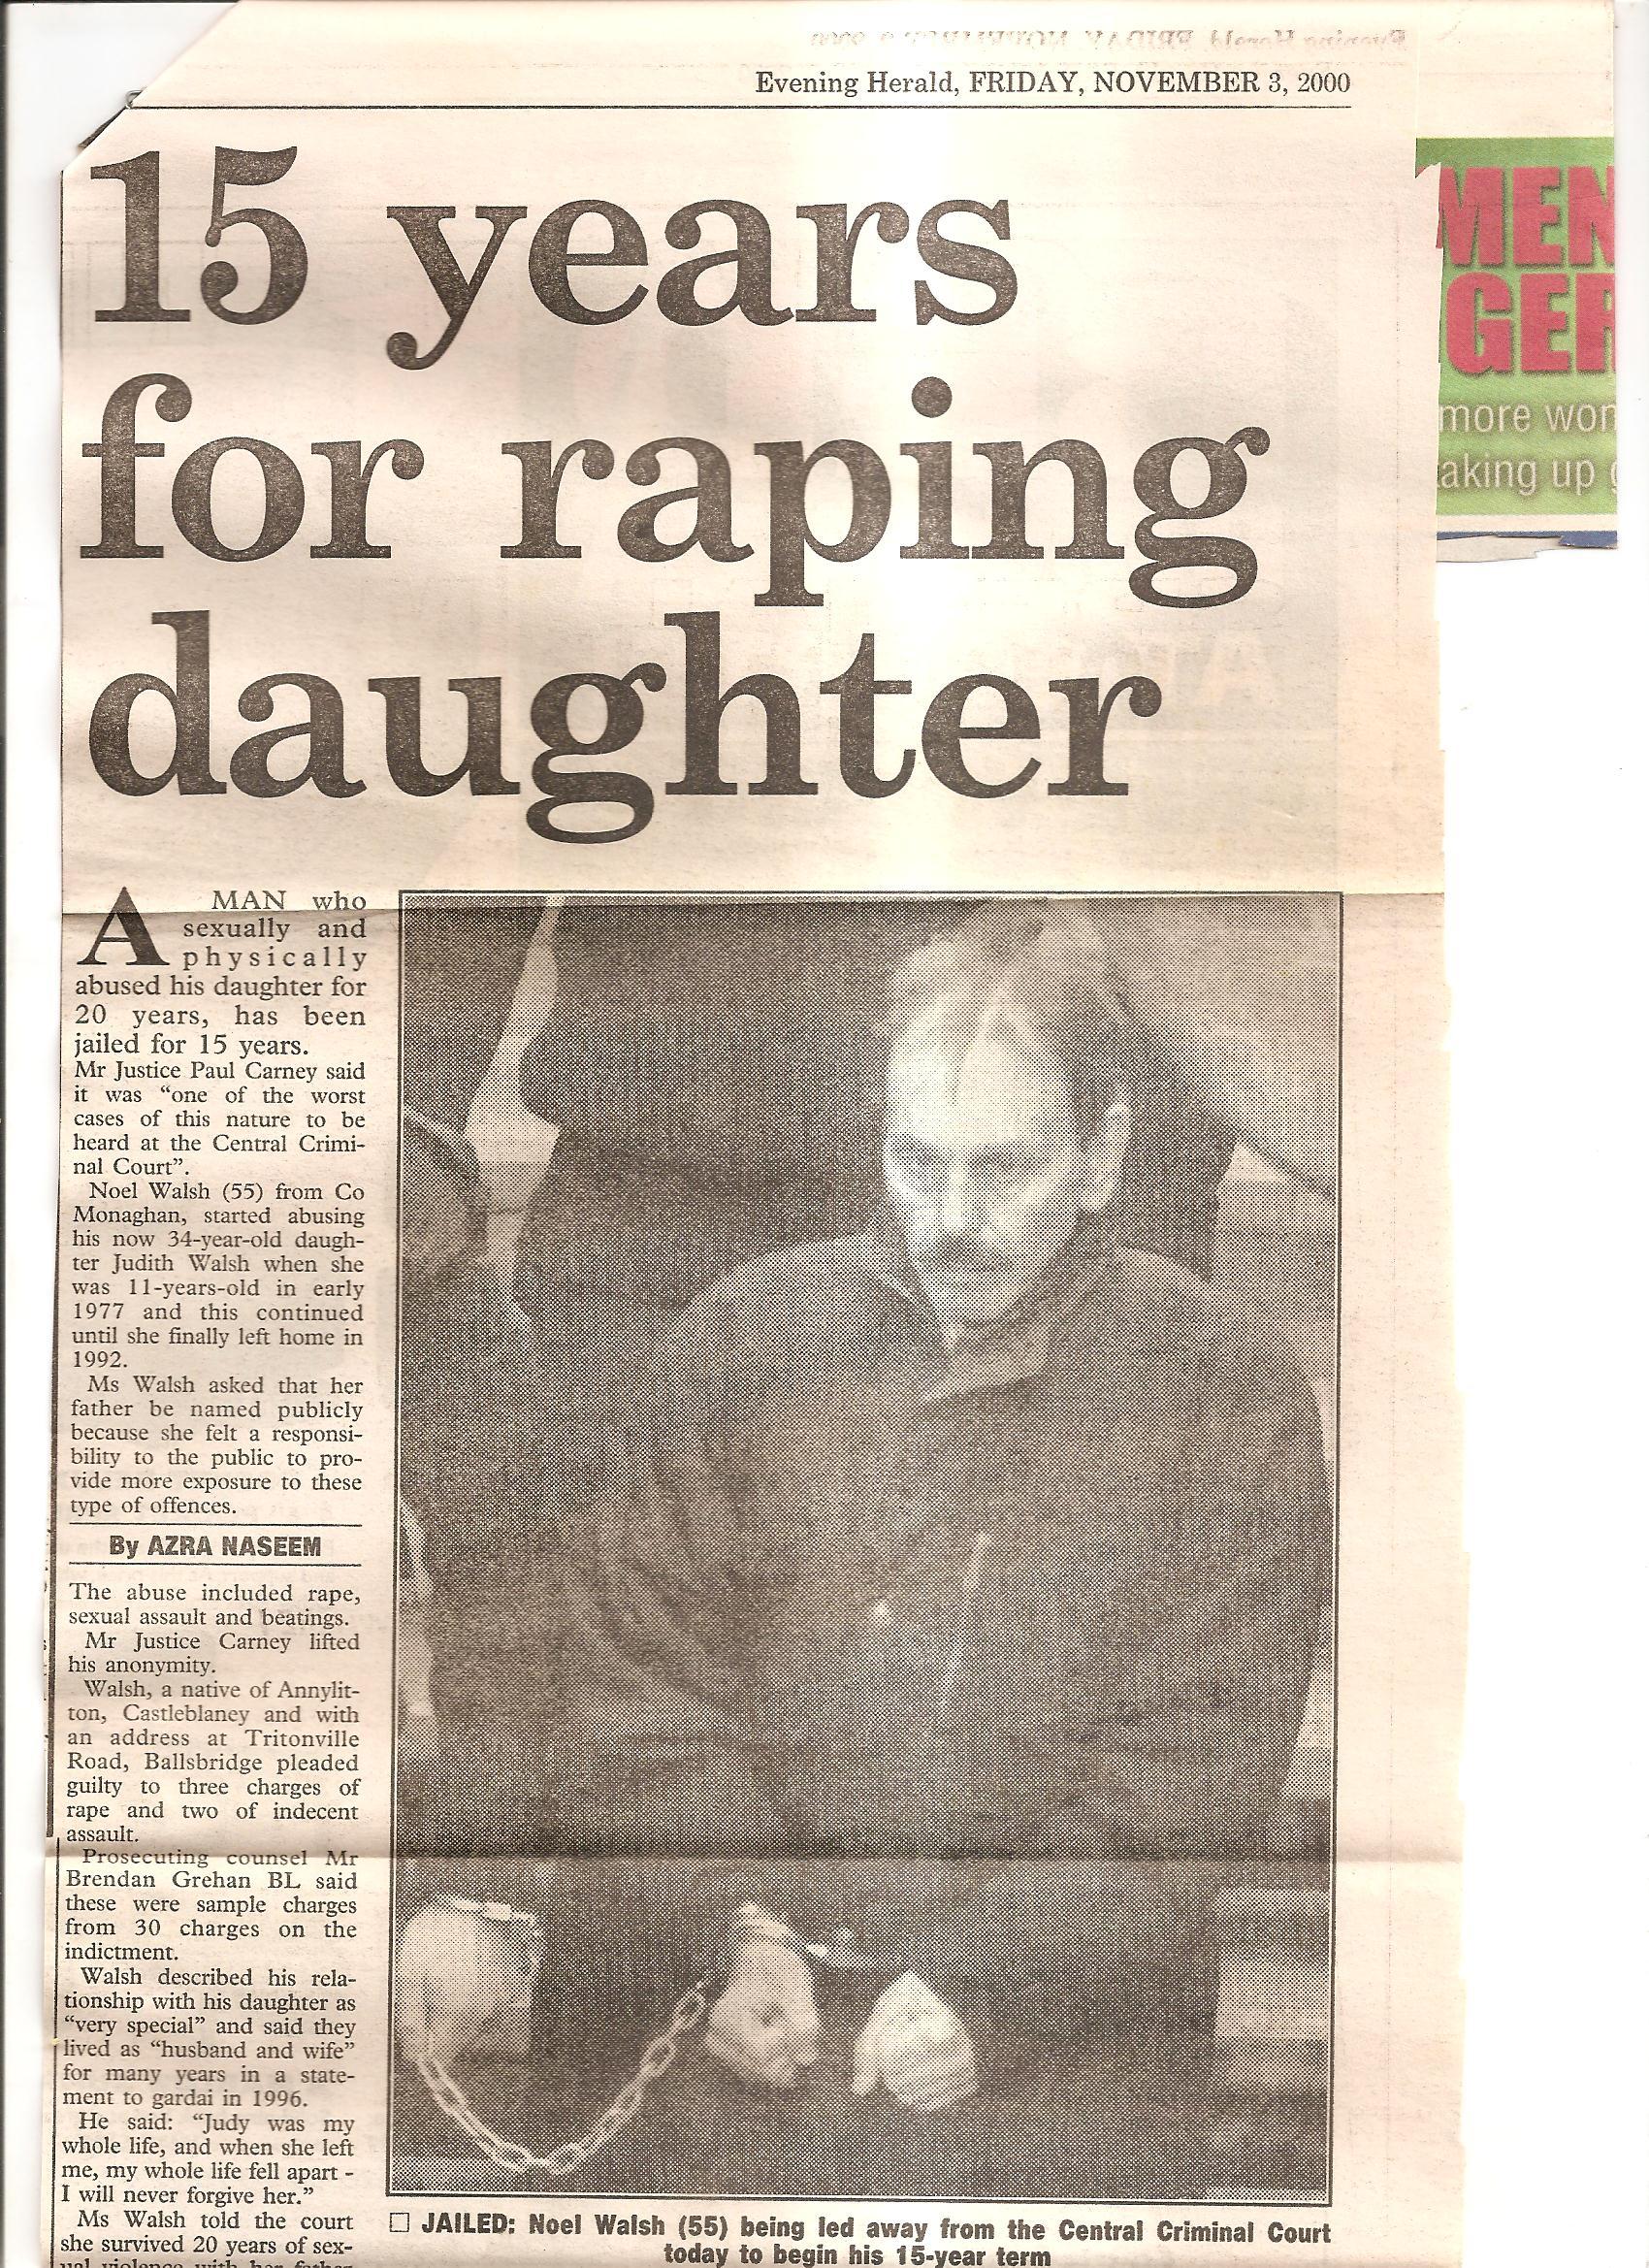 Evening Herald Nov00 page 1